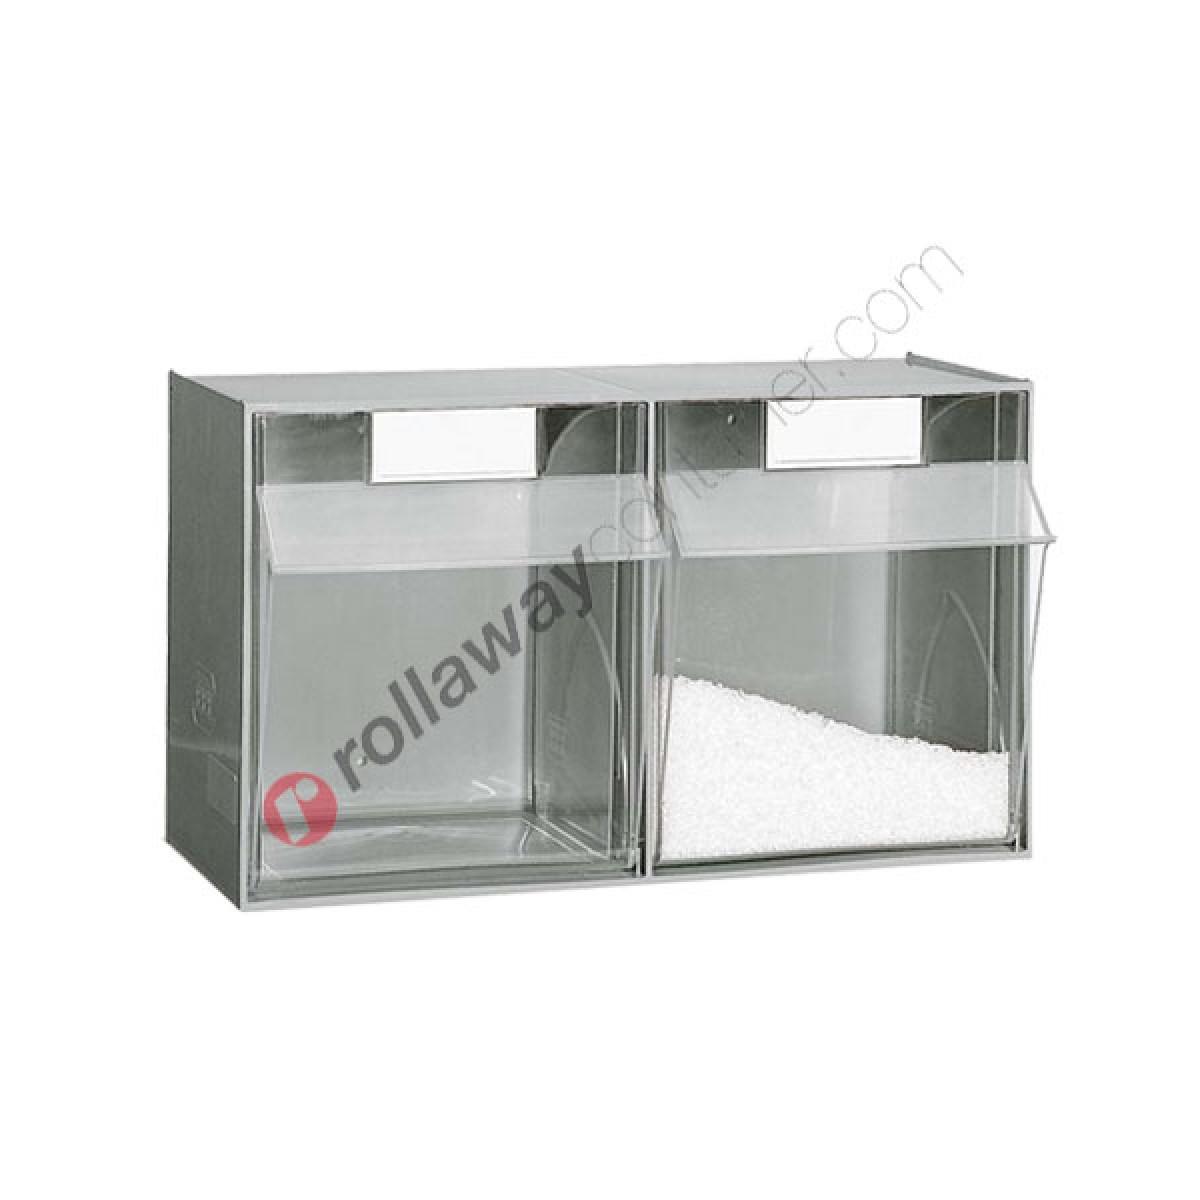 rangement visserie atelier 600 x 311 h 353 mm avec 2 tiroirs. Black Bedroom Furniture Sets. Home Design Ideas